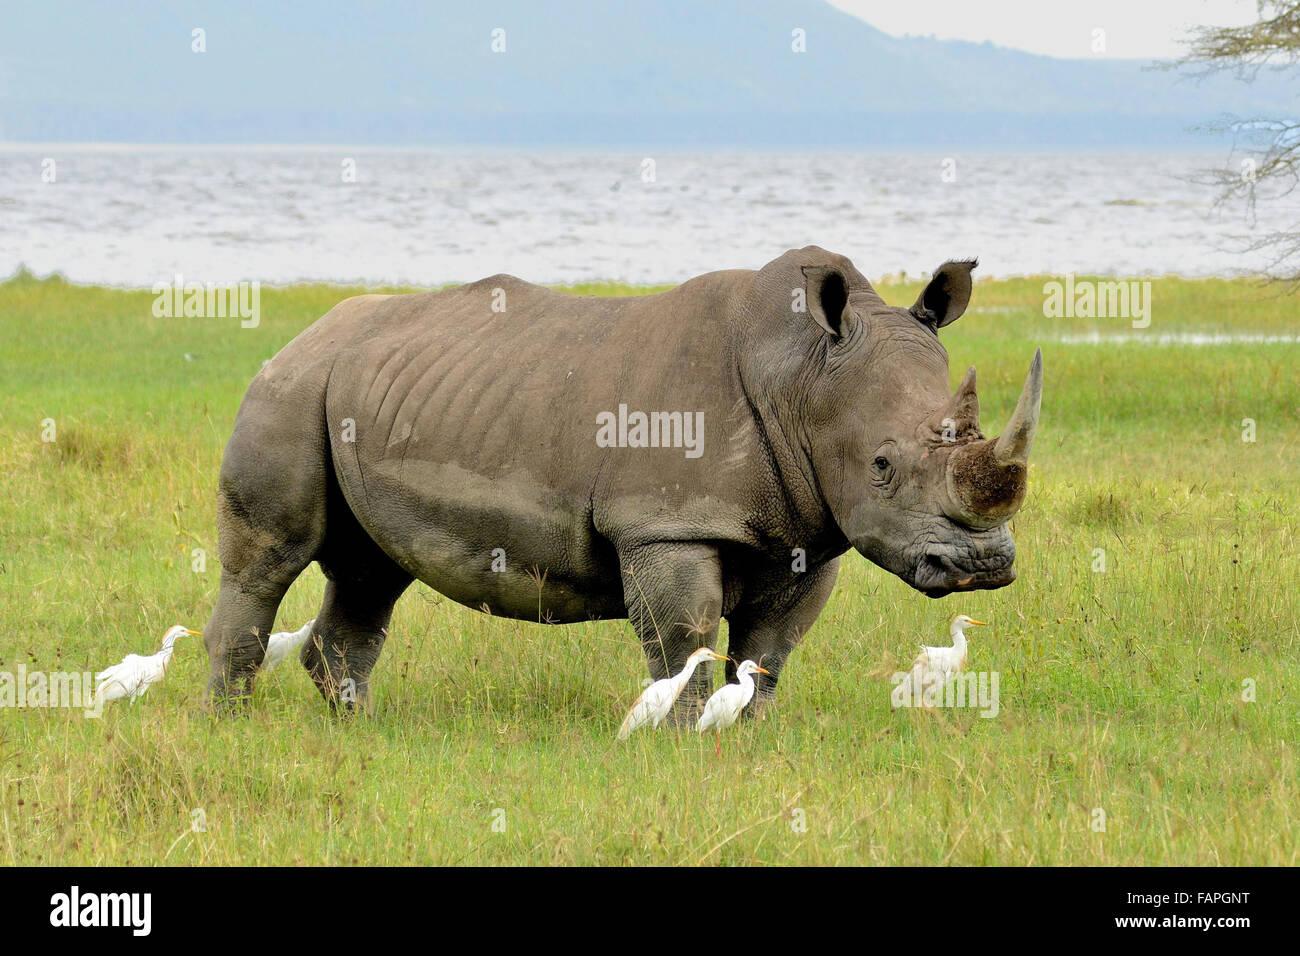 Le rhinocéros blanc au Parc National du Lac Nakuru au Kenya Photo Stock